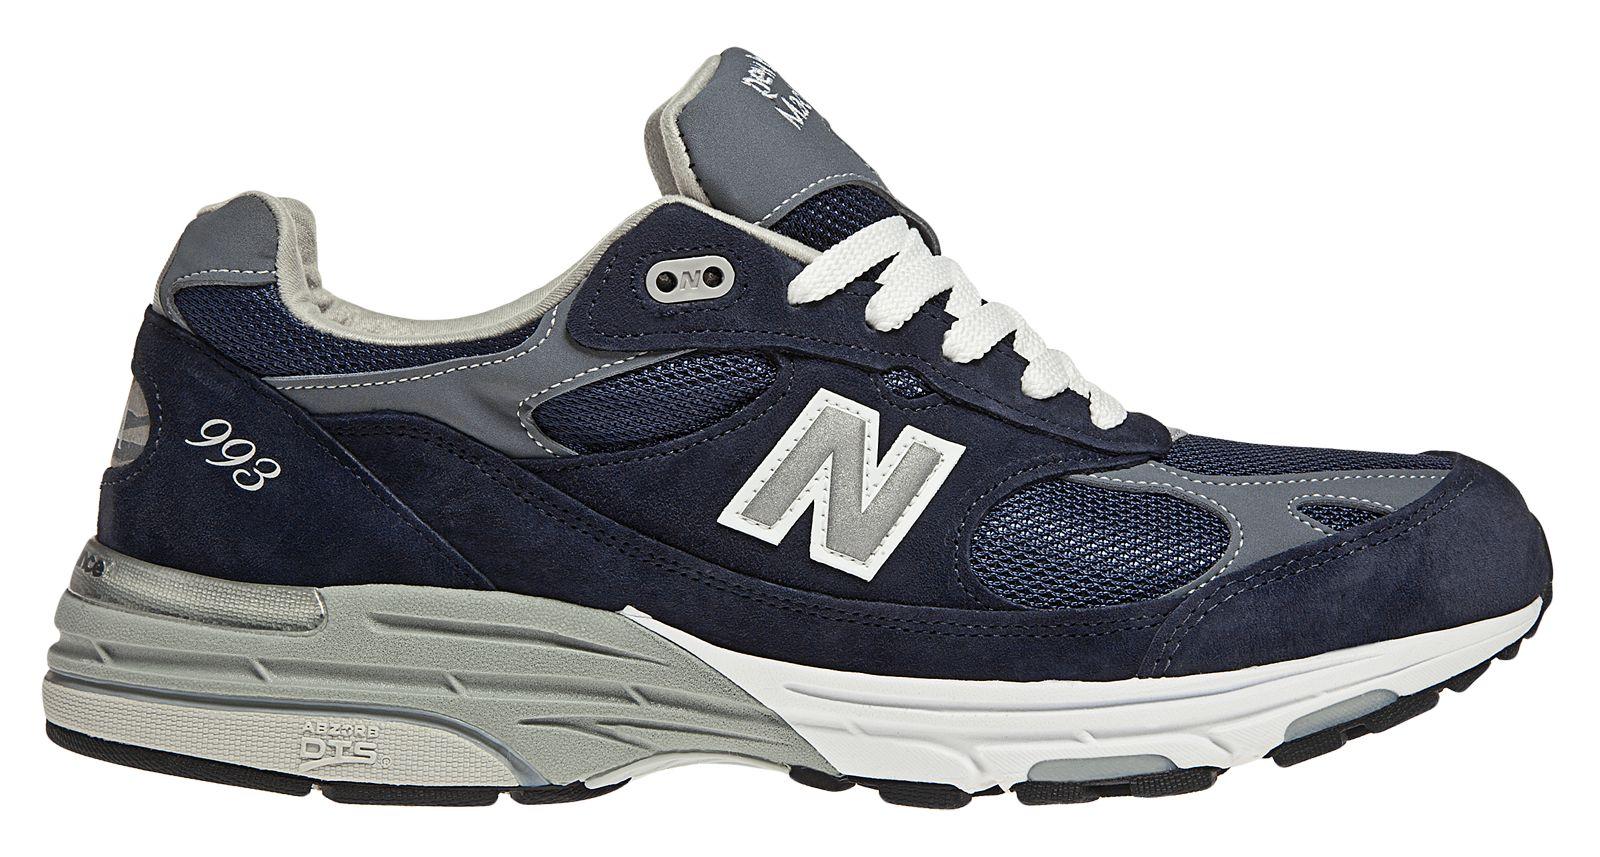 New Balance 993 - Men\u0027s, Women\u0027s \u0026 Kid\u0027s NB 993 on Sale Now   Joe\u0027s  Official New Balance Outlet